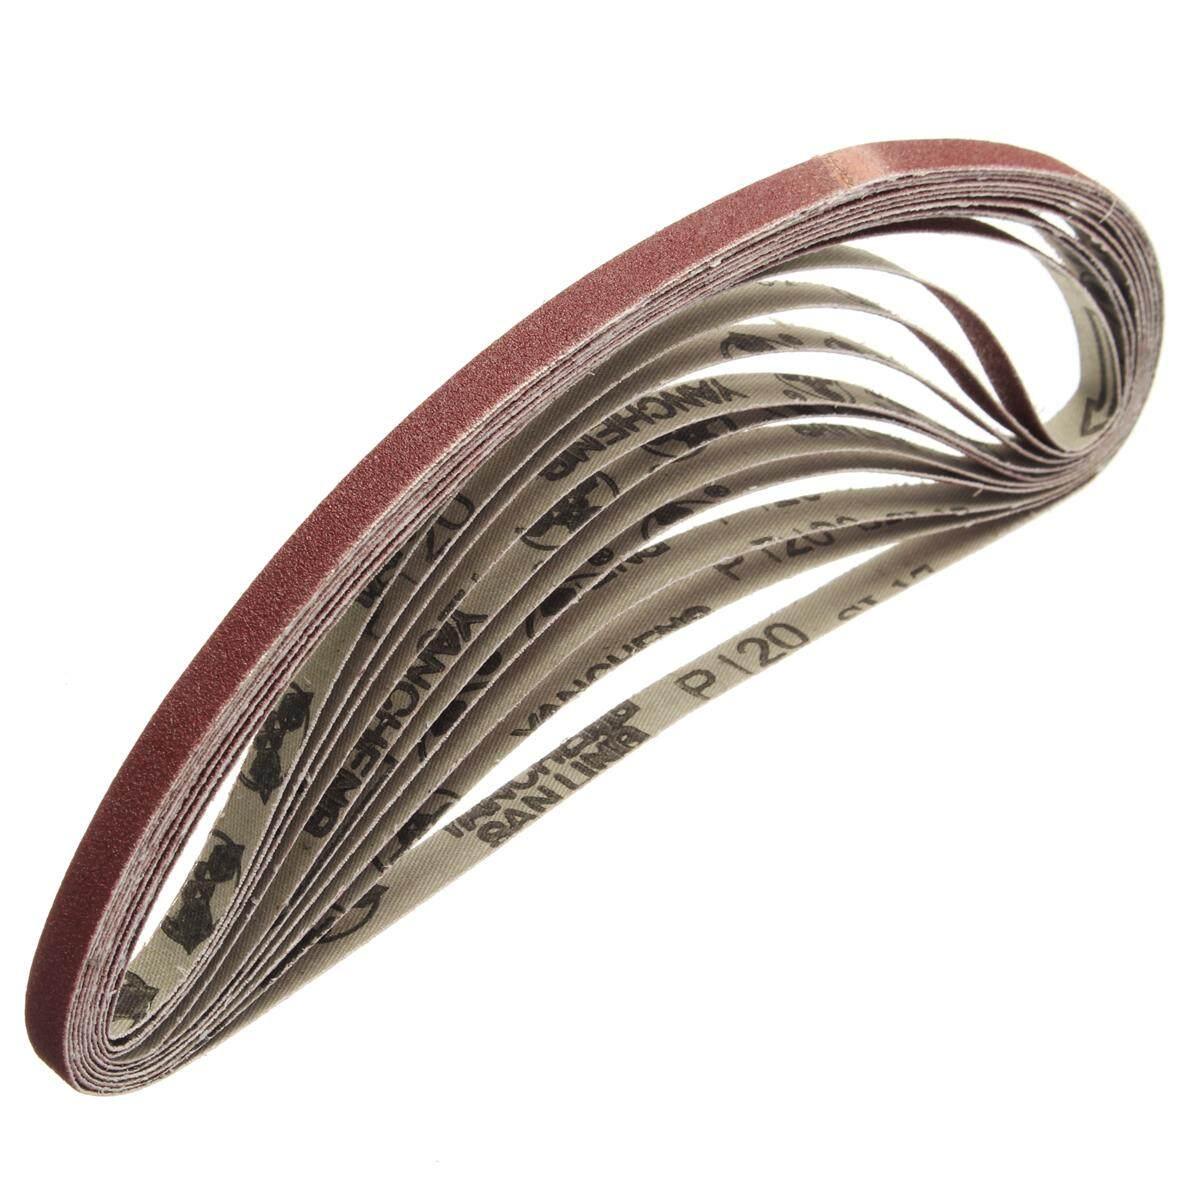 10x600mm Sanding Belt For flush belt machines polishing machine 120 Grit - intl